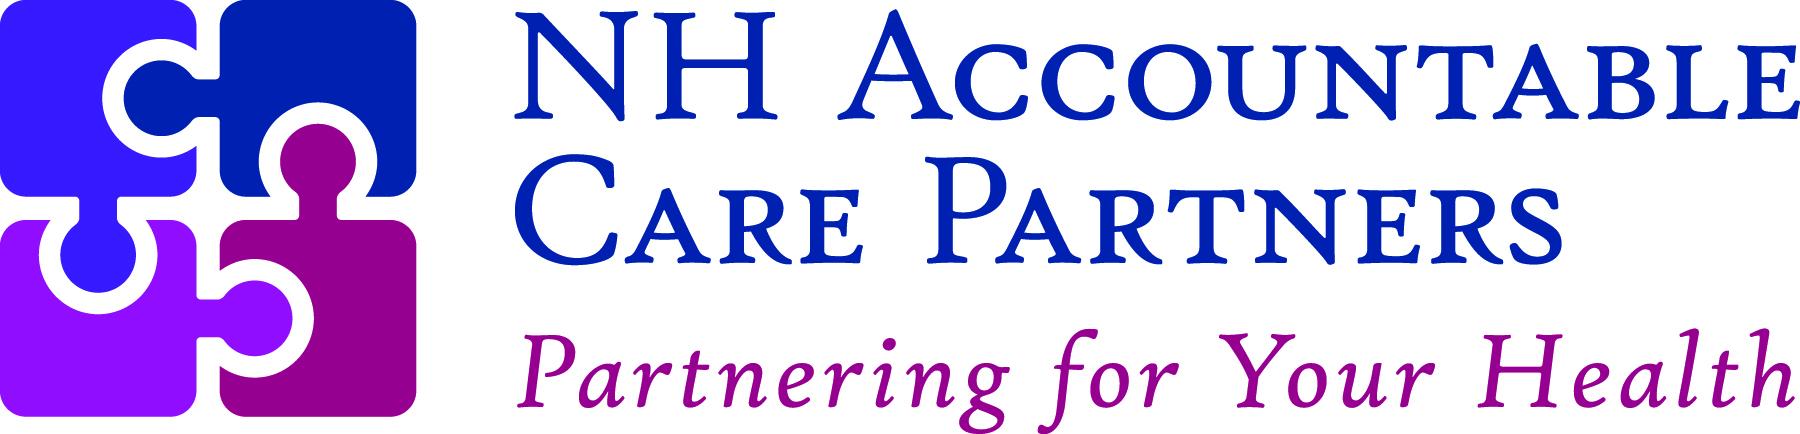 NH Accountable Care Partners